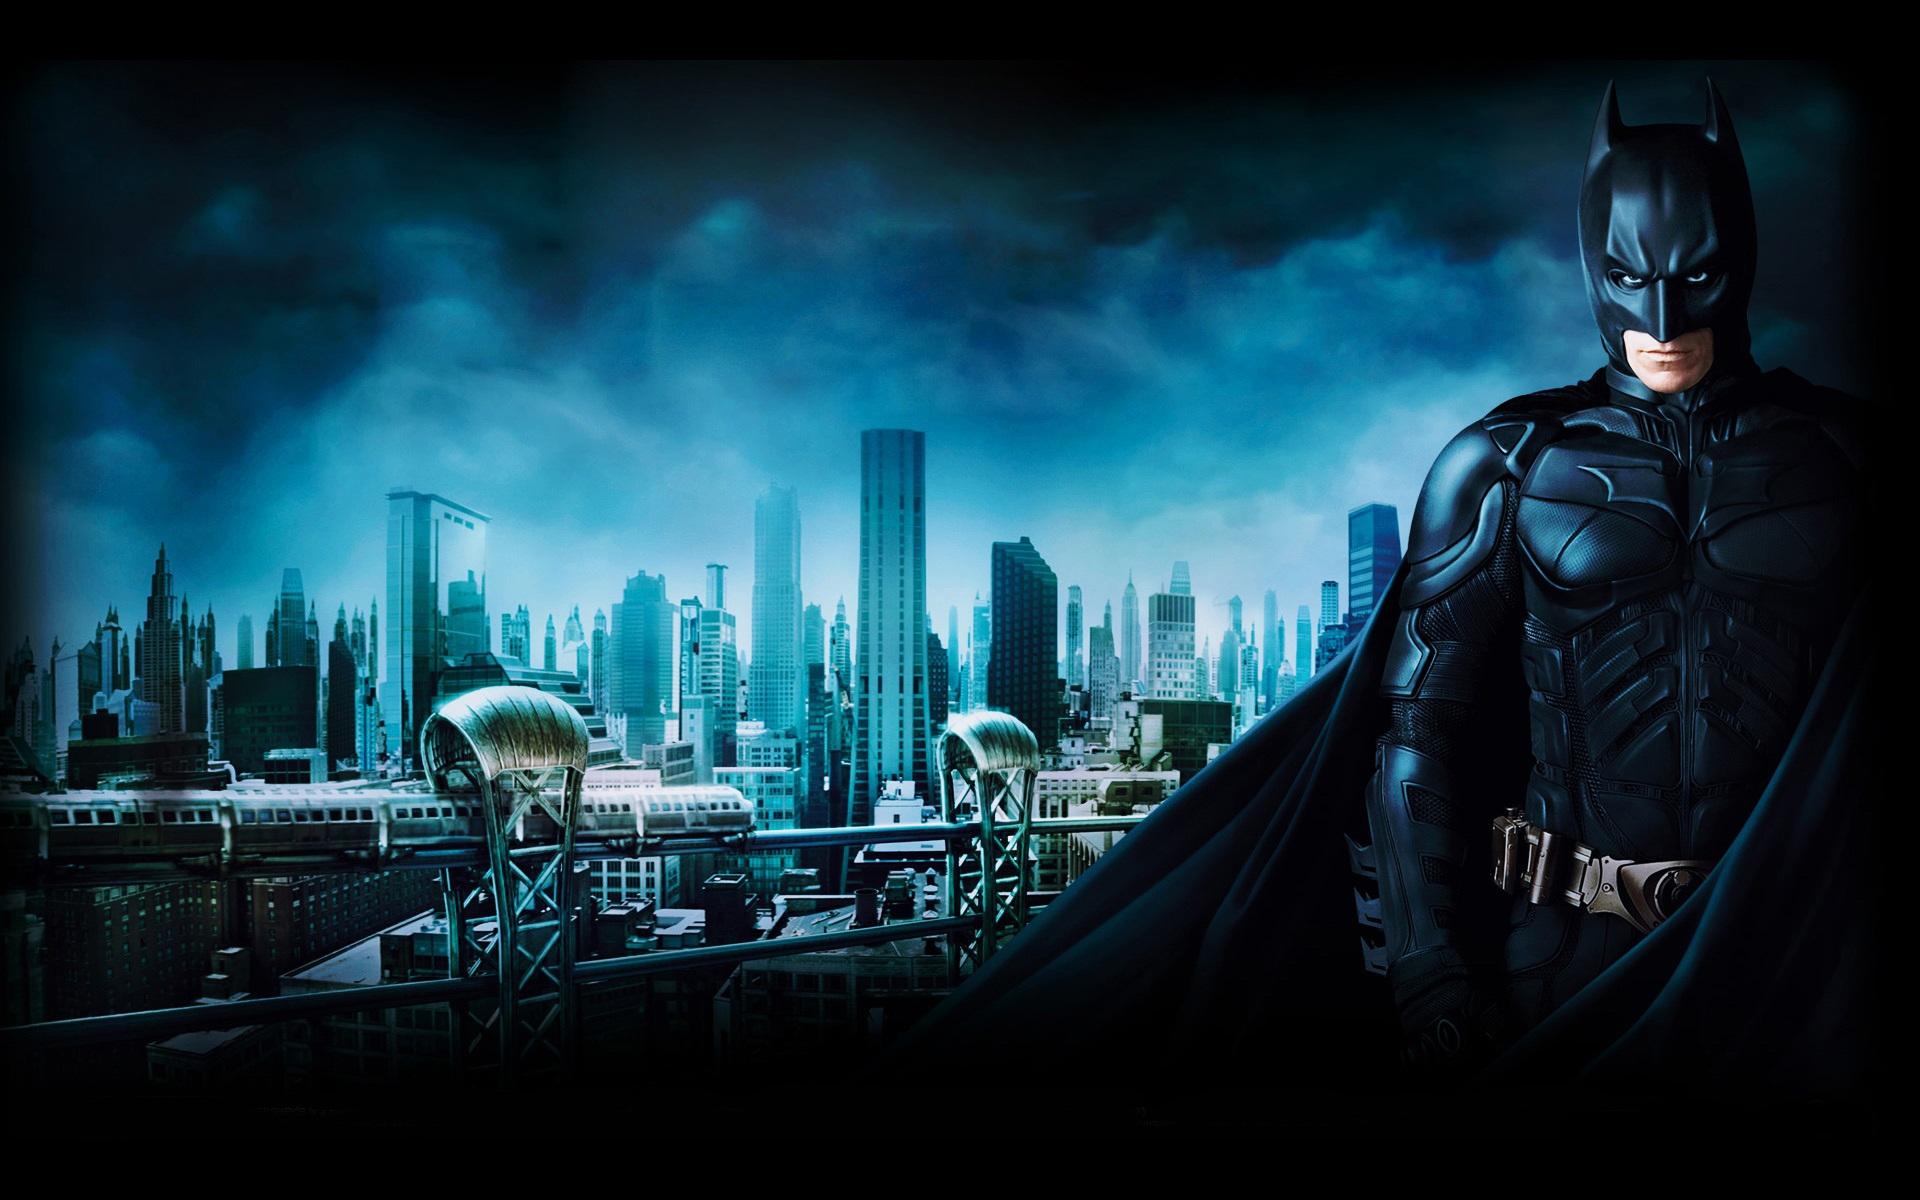 Batman-Wide-HD-wallpaper-wp3802834